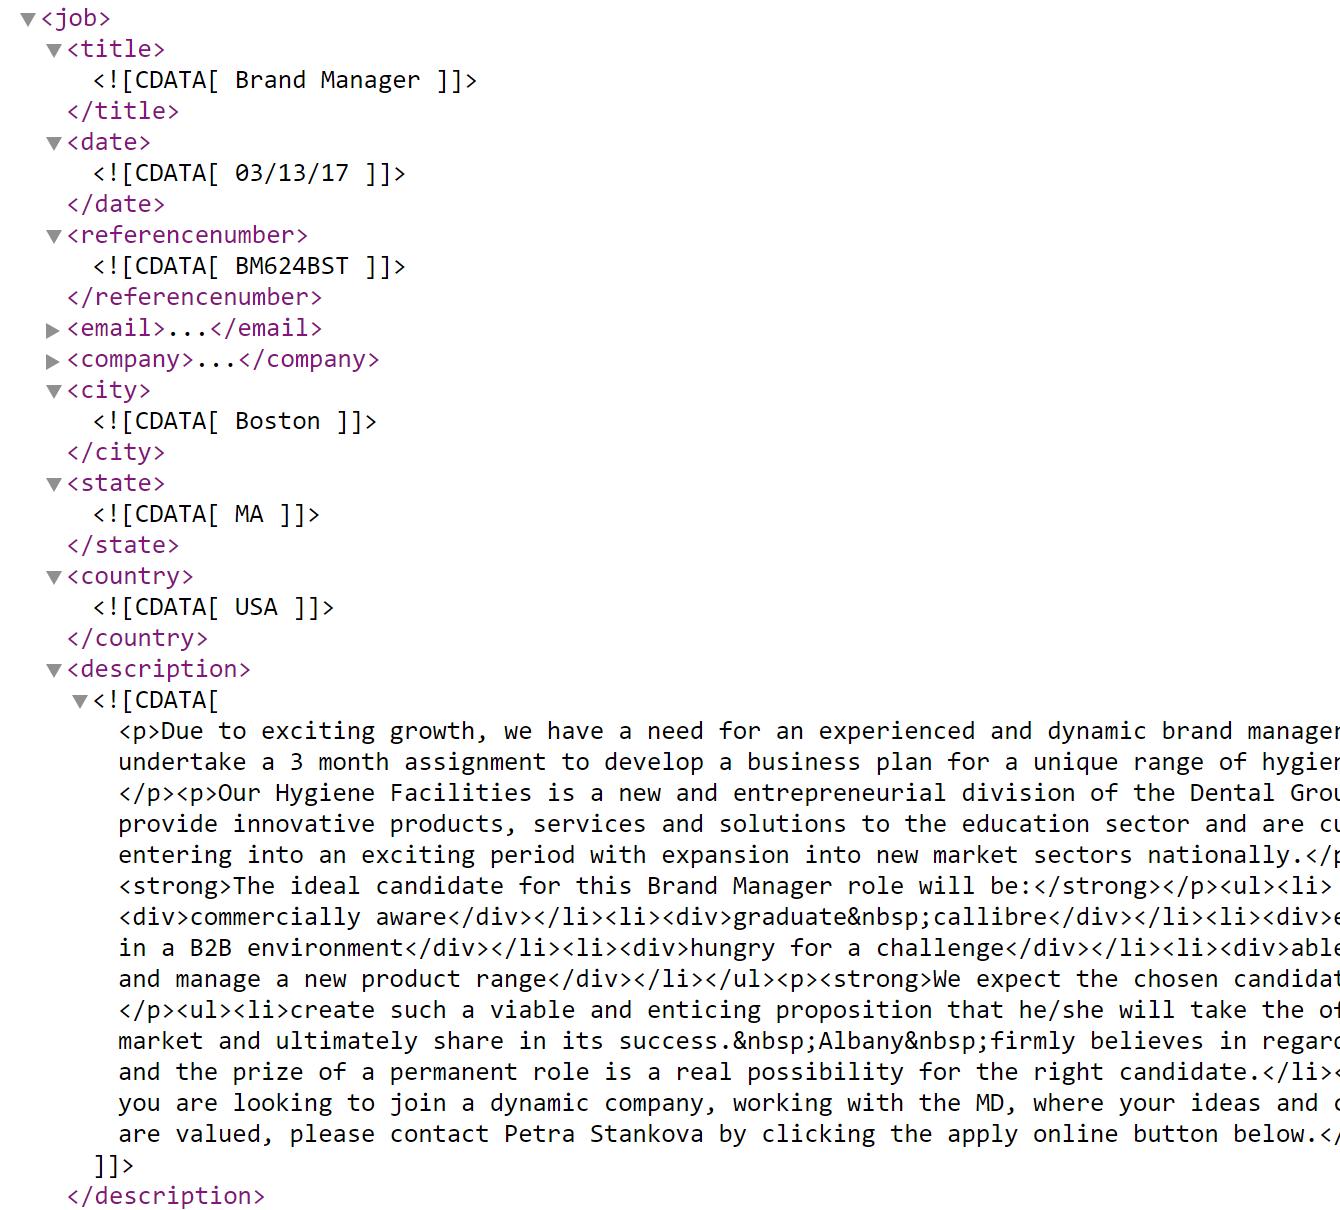 Job-wrapping-job-posting-via-XML